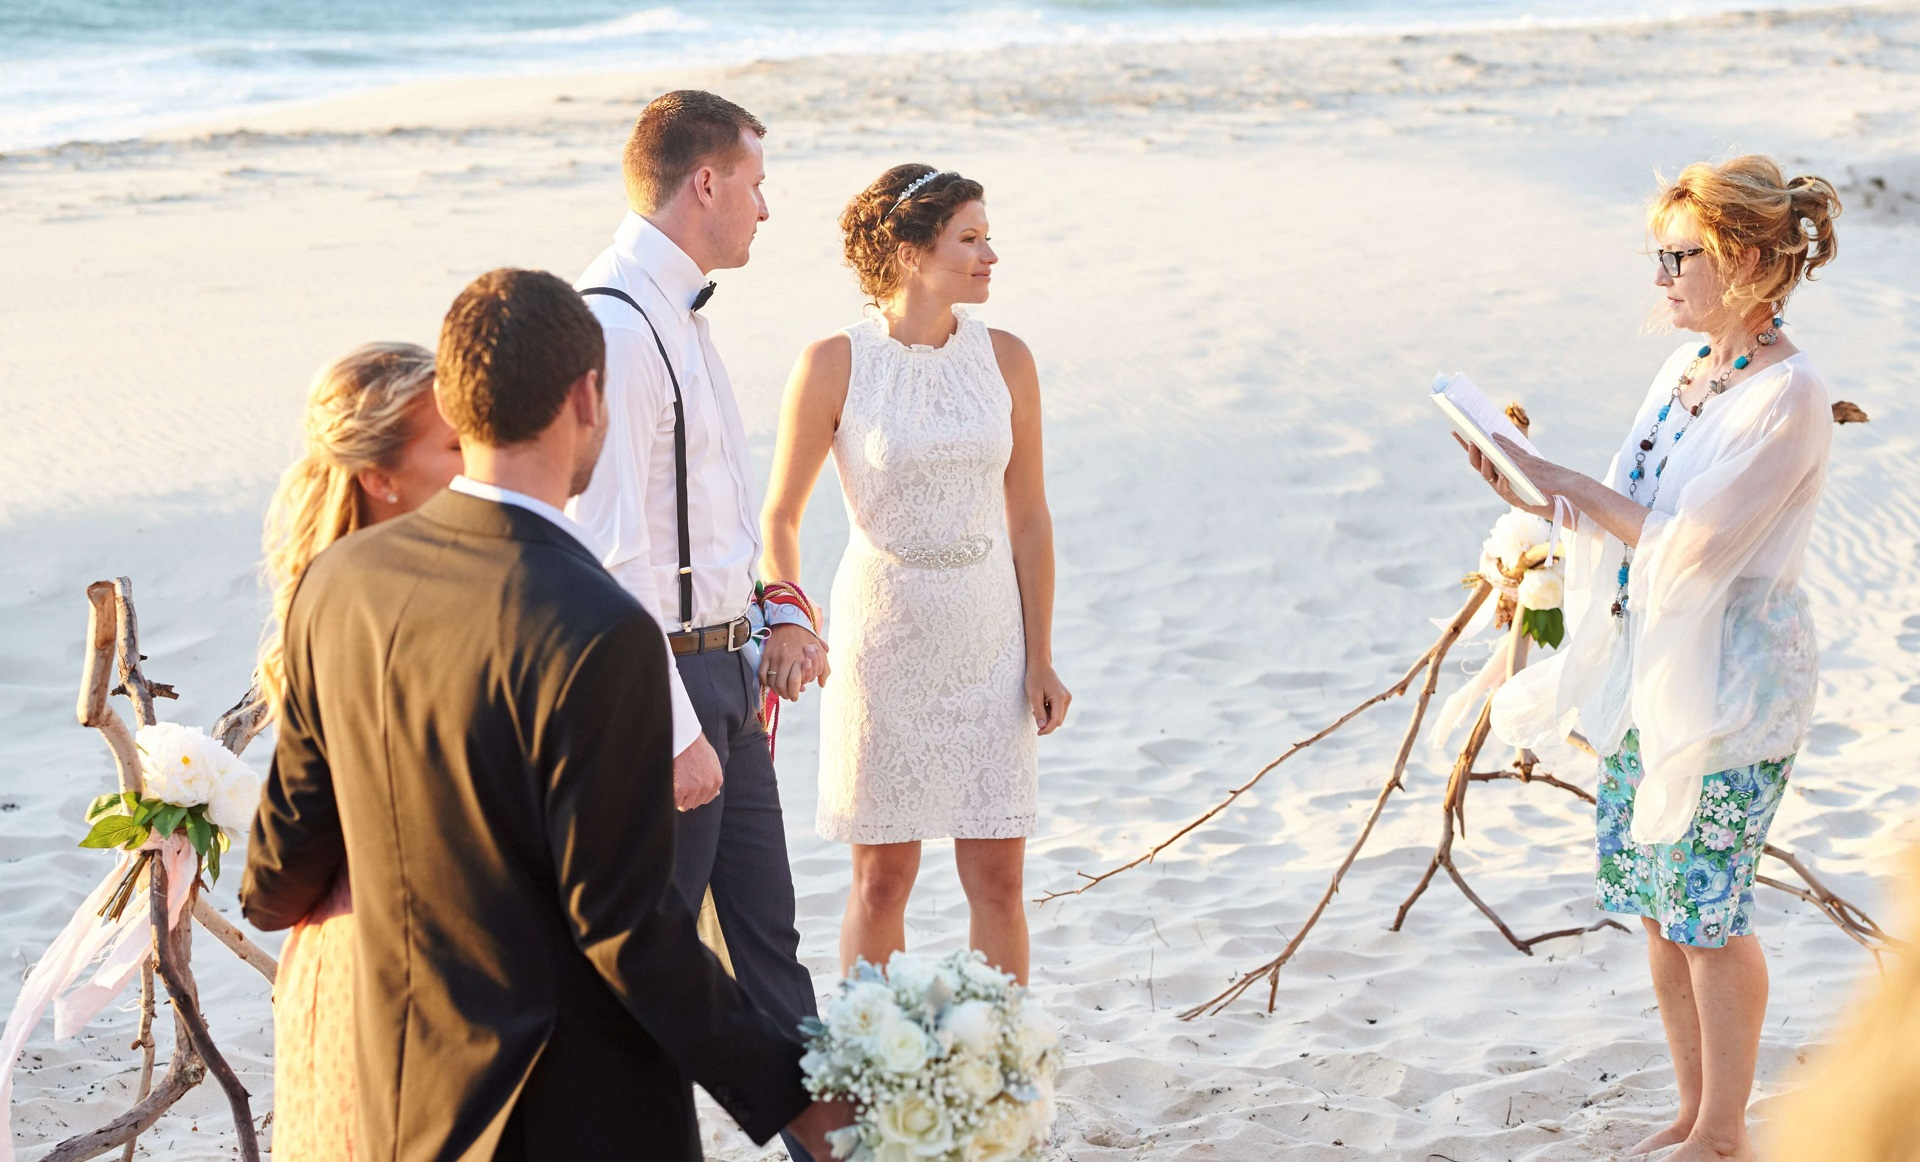 https://www.lovebirdceremonies.com.au/wp-content/uploads/2020/07/Committment-Ceremony.jpg